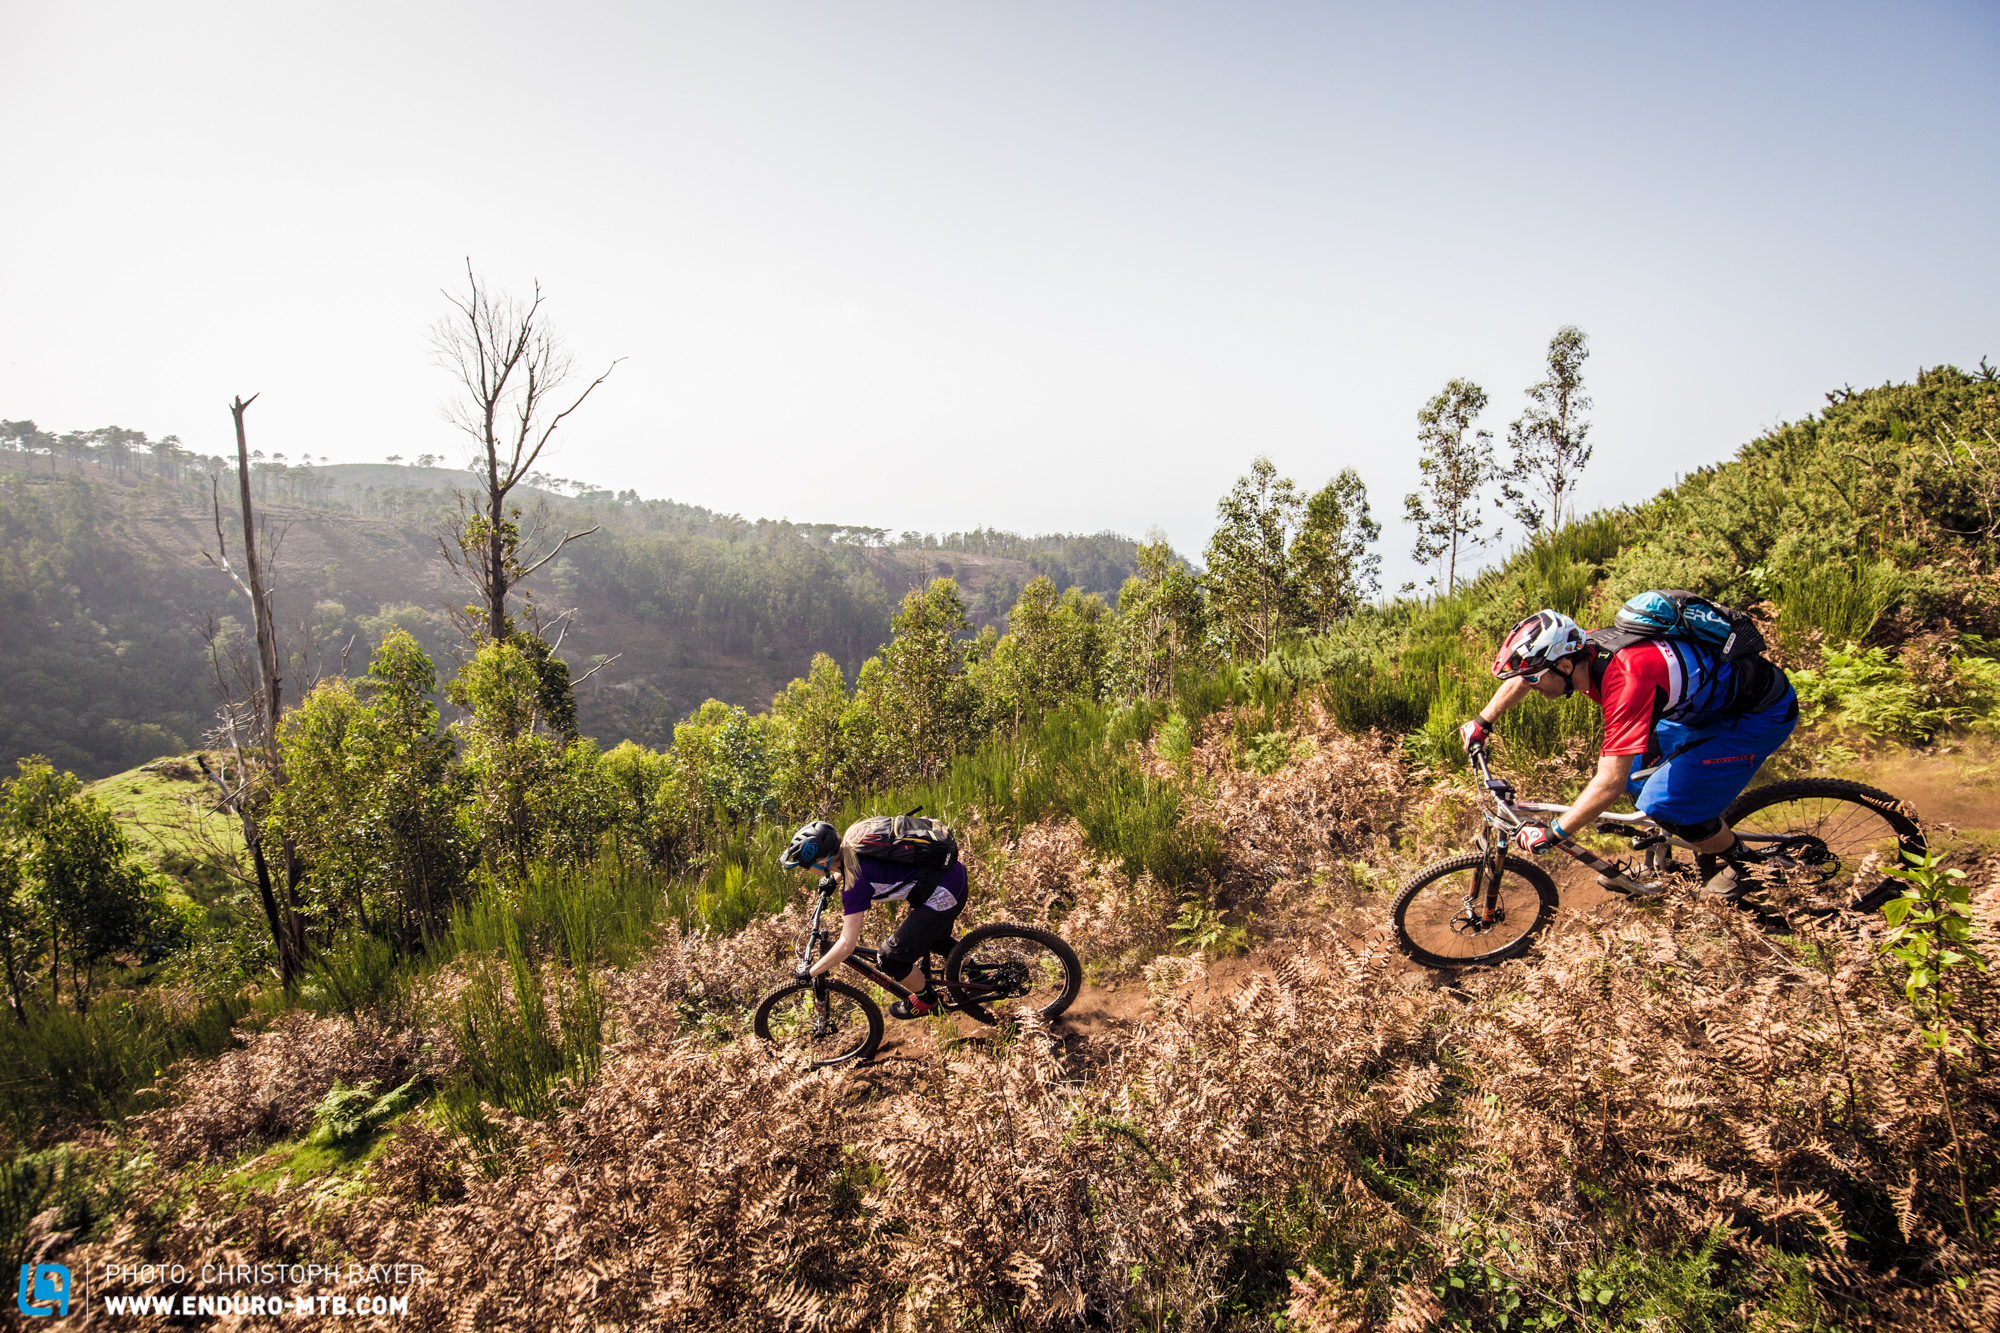 madeira-bike-holidays-travel-cb-29.jpg